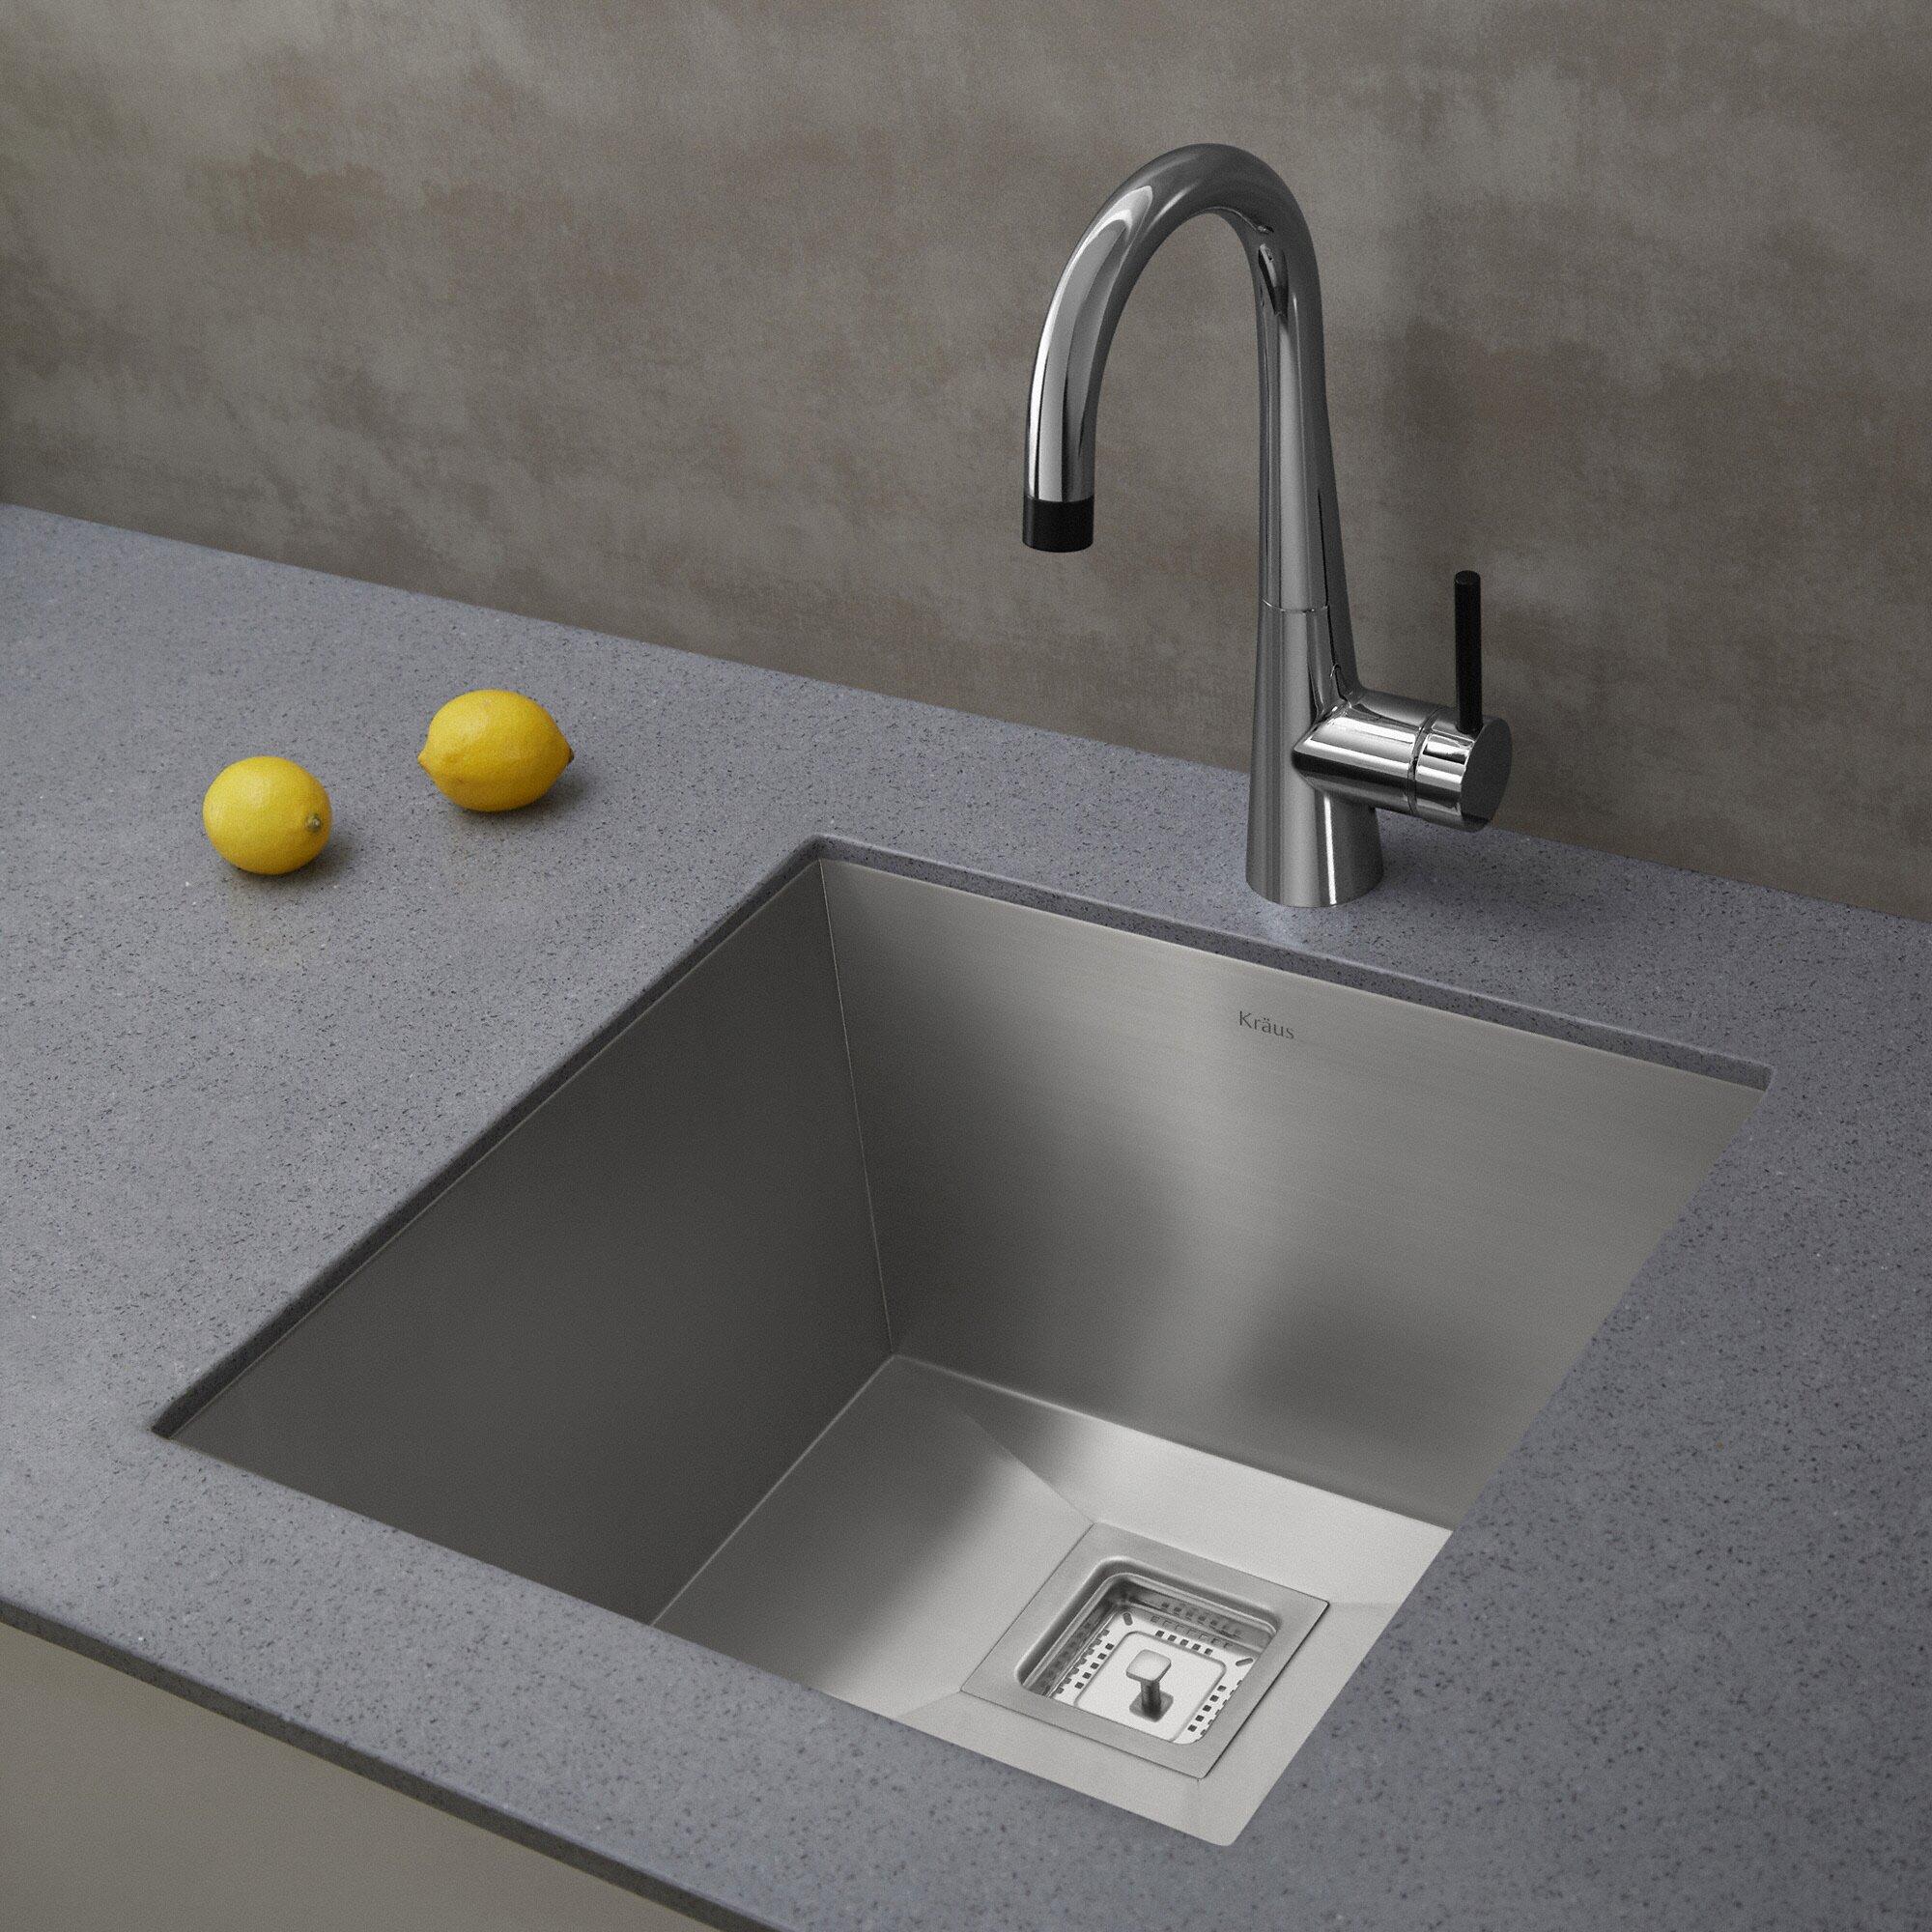 ... Undermount Single Bowl Stainless Steel Bar Sink & Reviews Wayfair